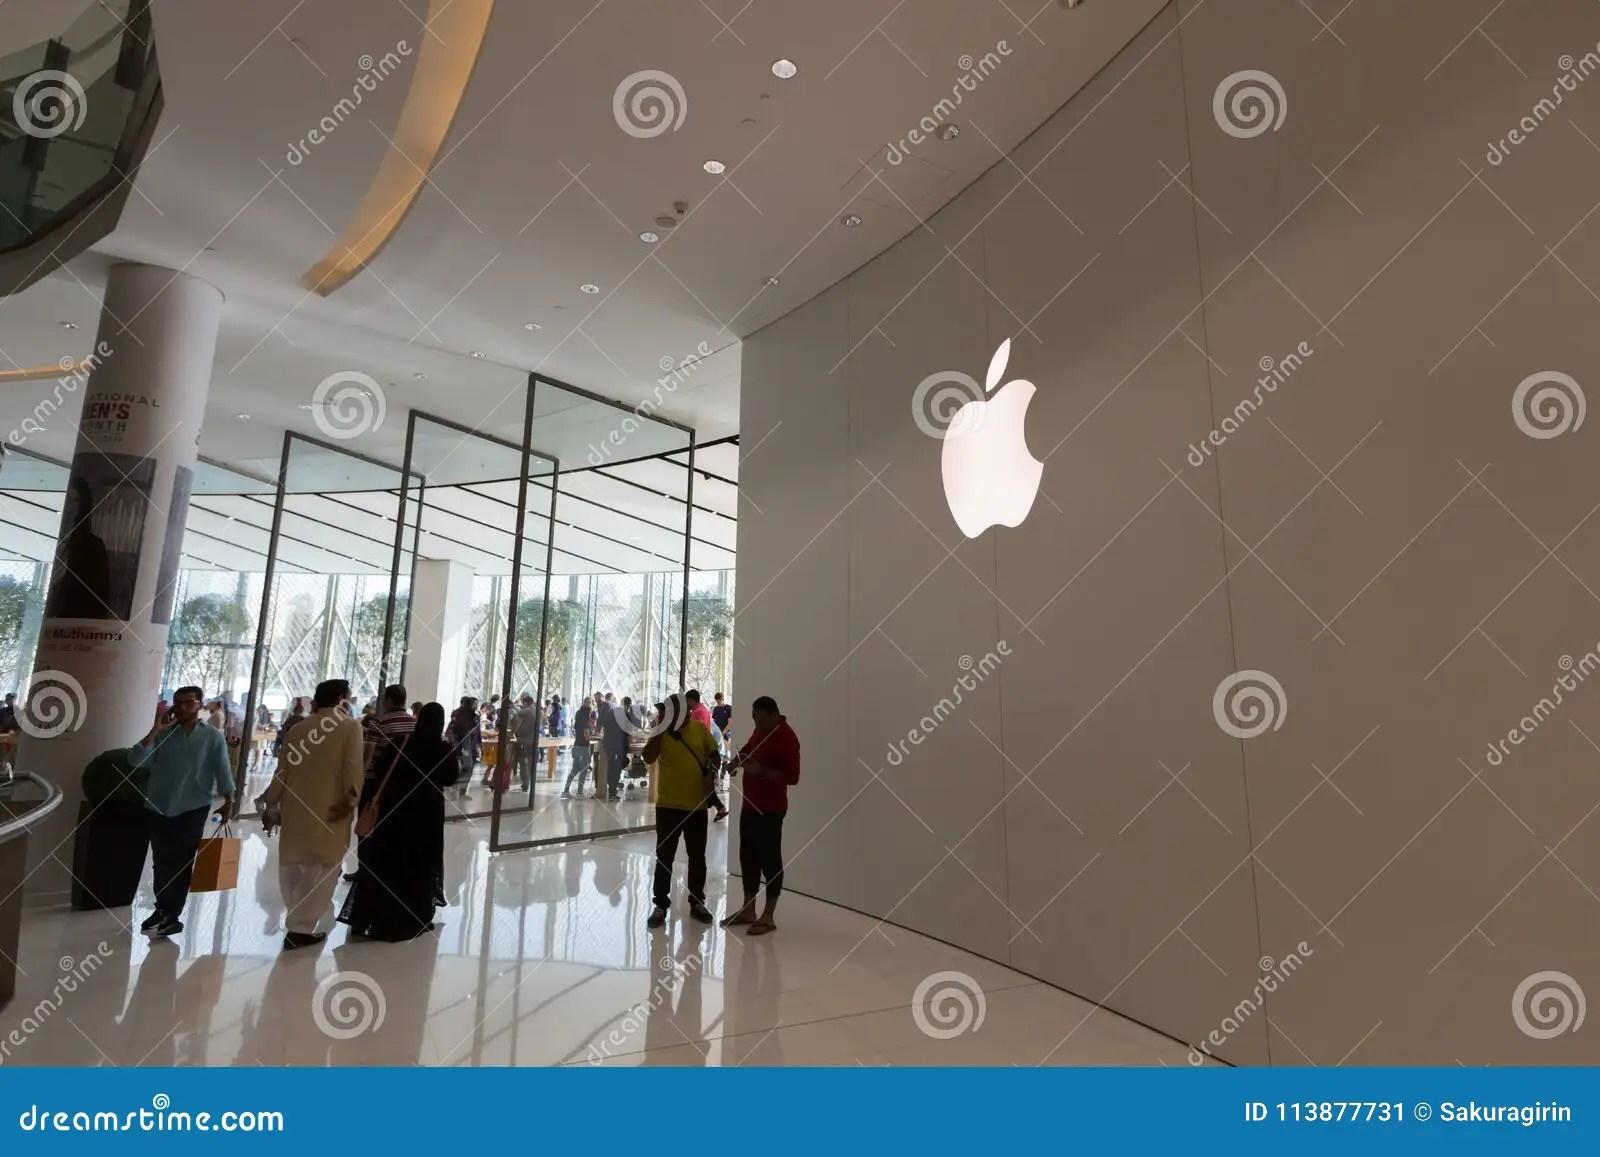 Apple Store In Dubai Mall. United Arab Emirates Editorial Photo - Image of electronics. arab: 113877731